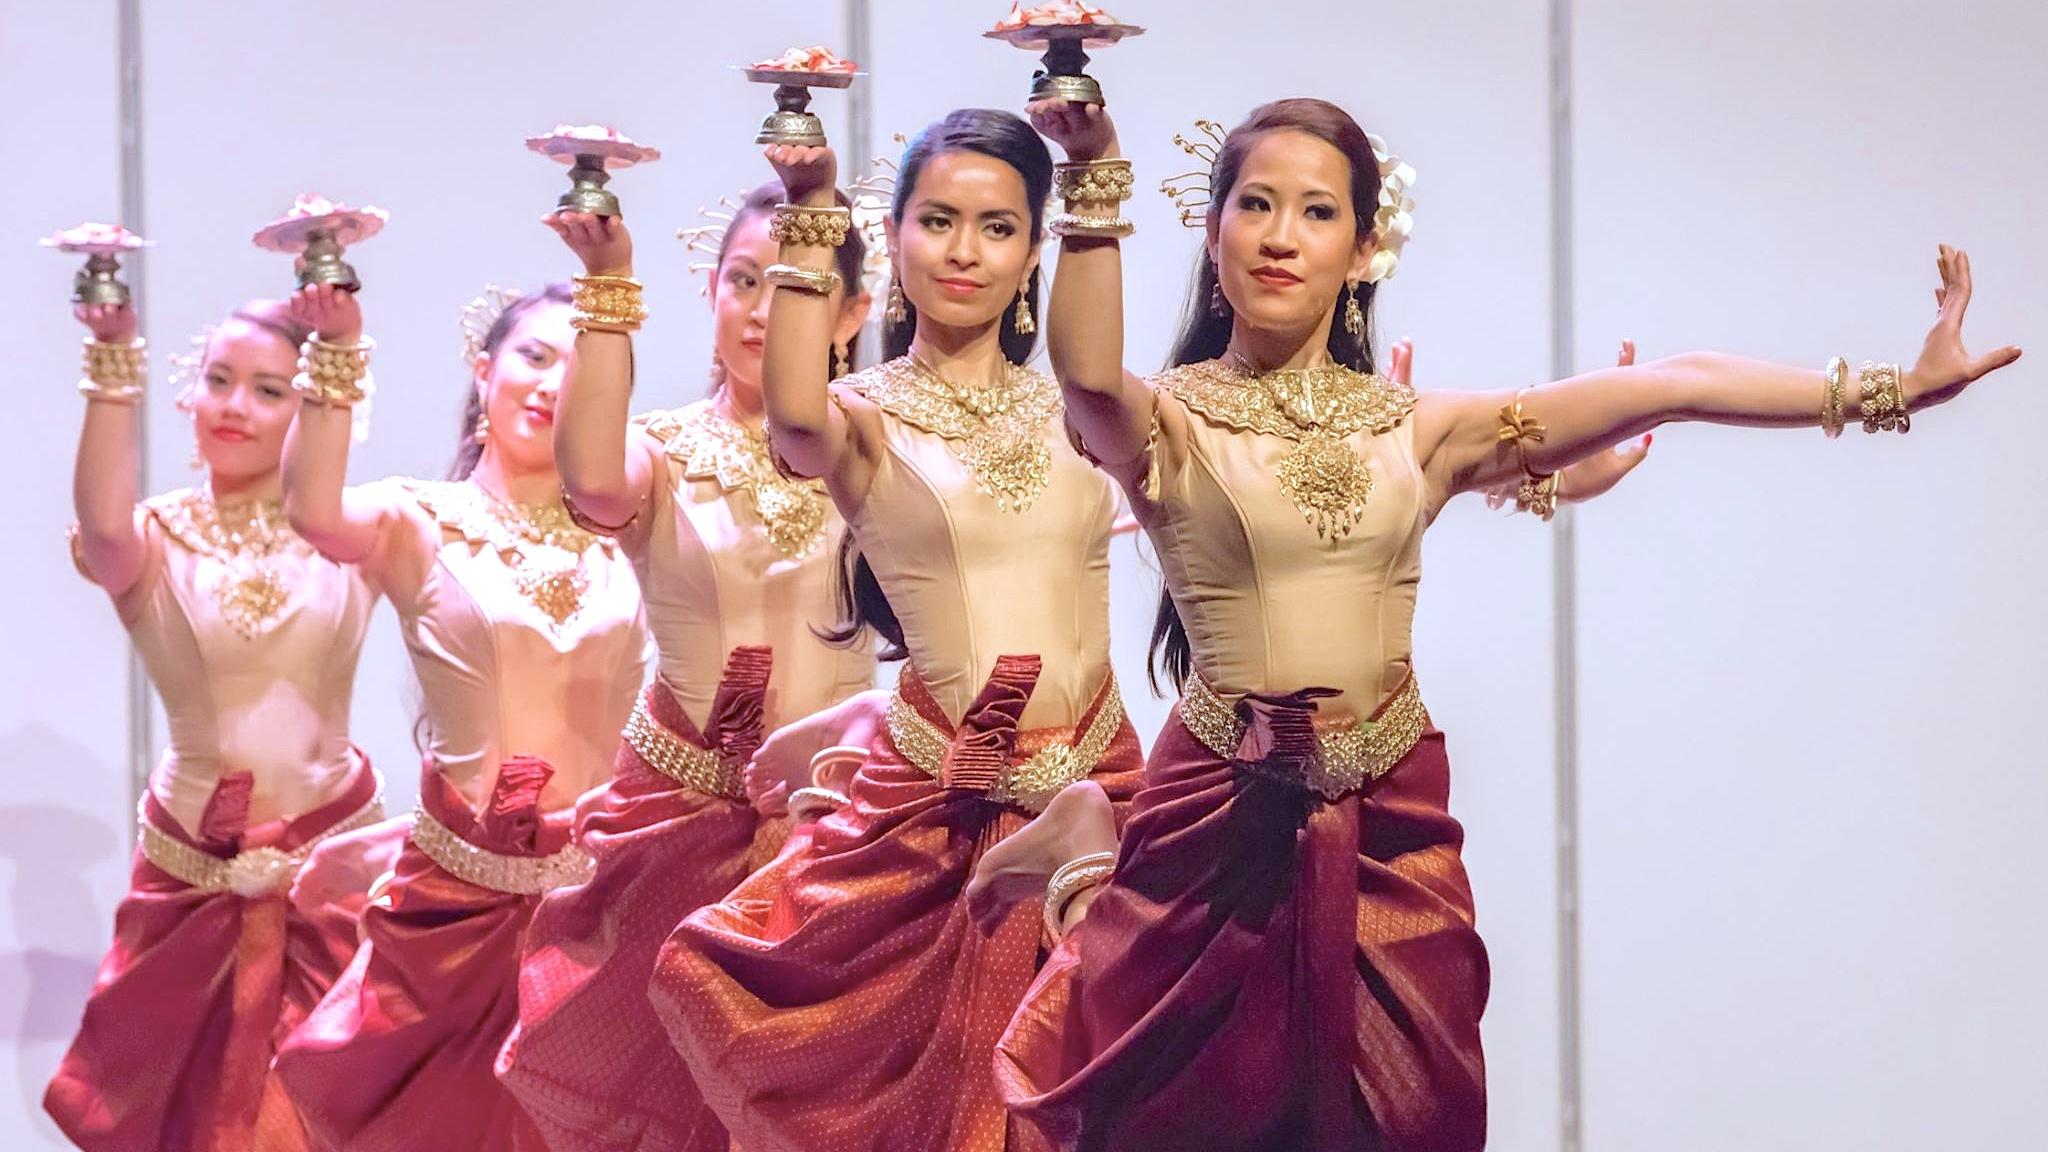 Ballets classiques